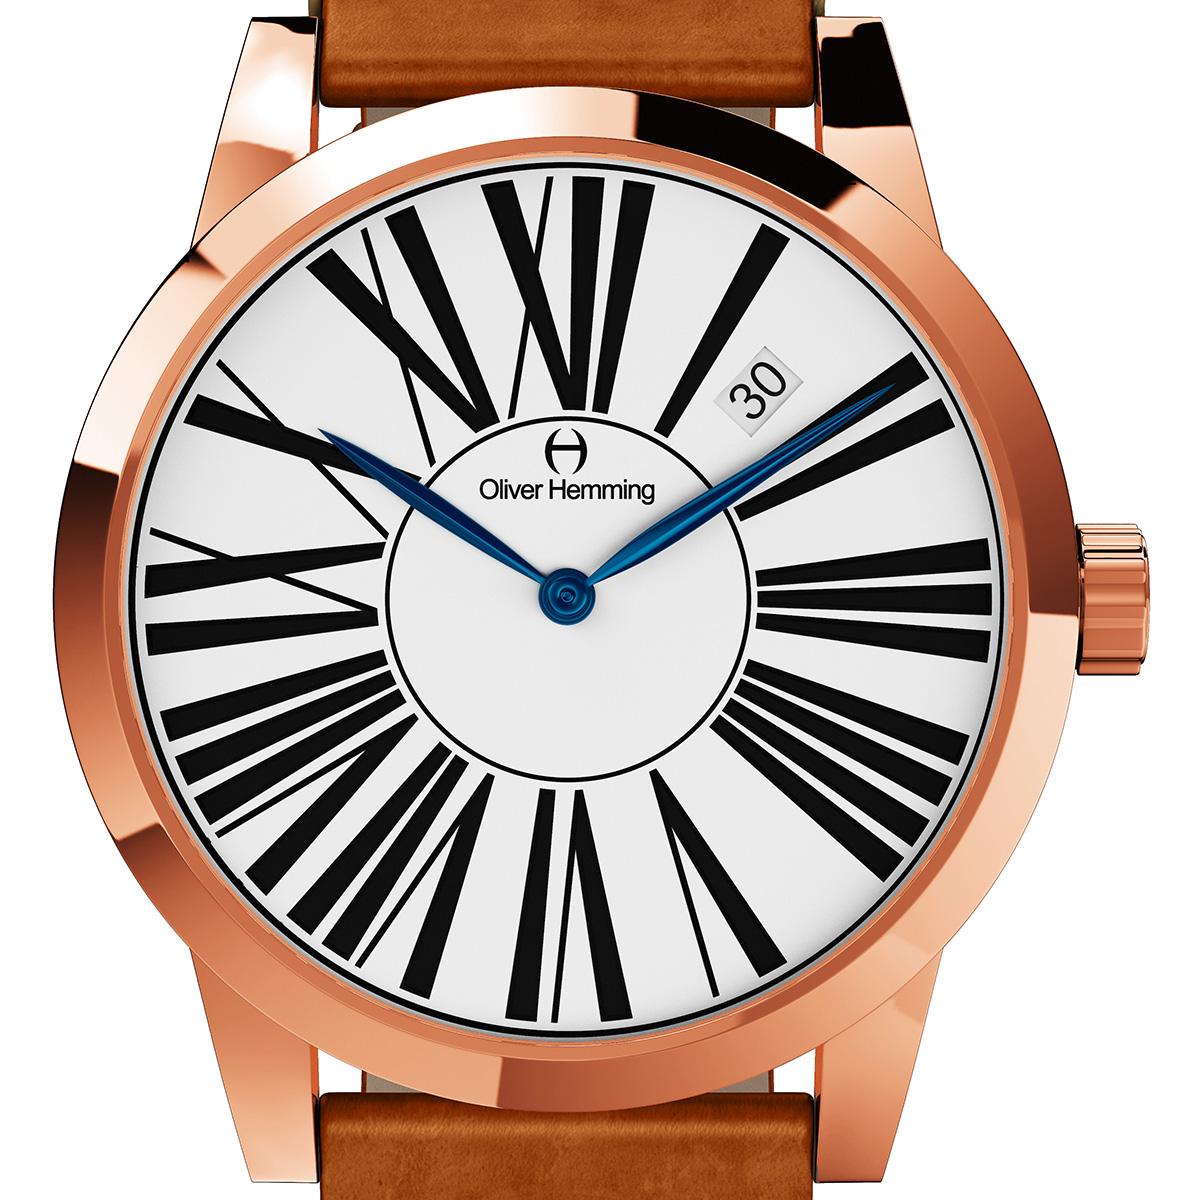 Oliver Hemming オリバーヘミング クォーツ 腕時計 イギリス アート デザイン [WT17R53WVT] 正規代理店品 純正ケース メーカー保証